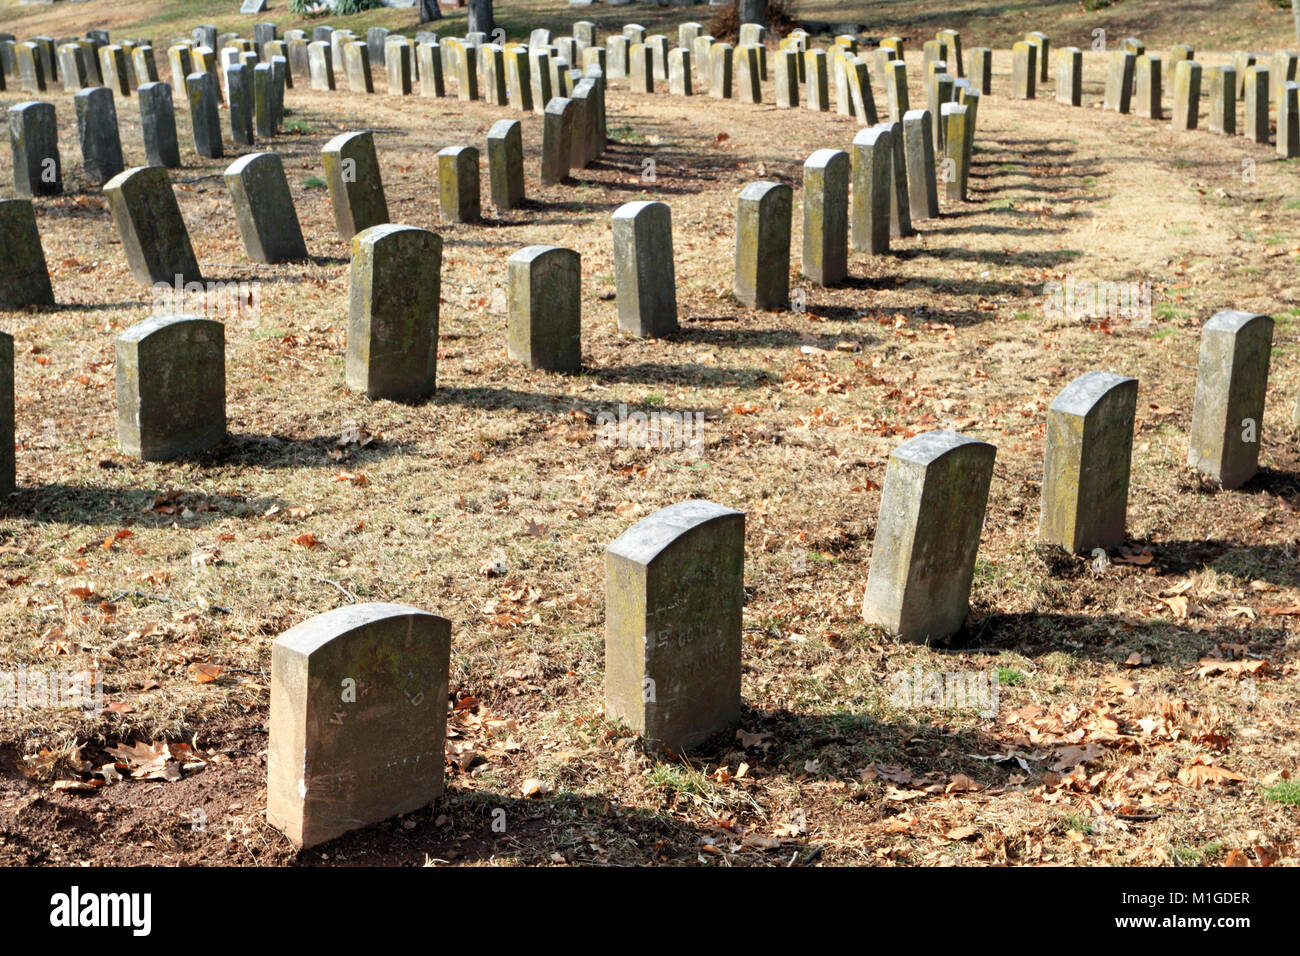 Memorial Park Cemetery Stock Photos & Memorial Park Cemetery Stock ...